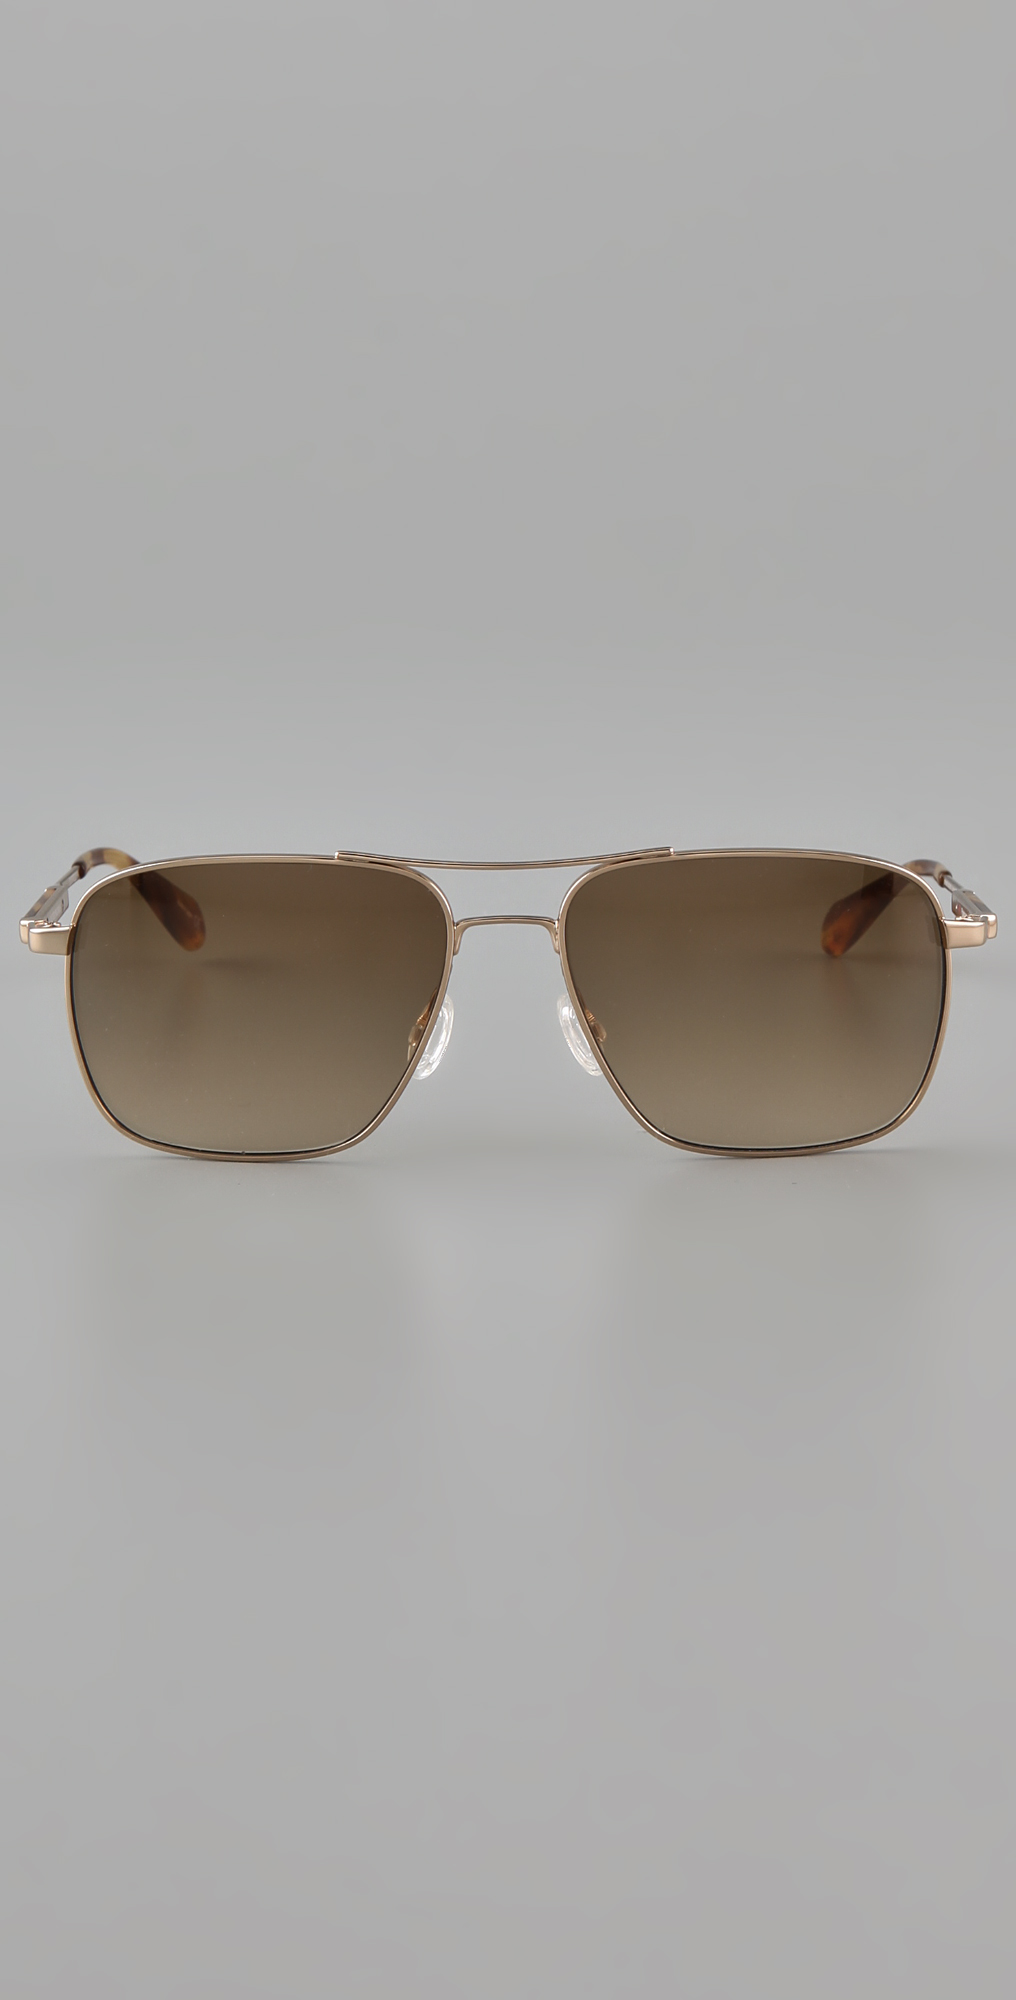 182f7c178c Oliver Peoples Eyewear Linford Sunglasses